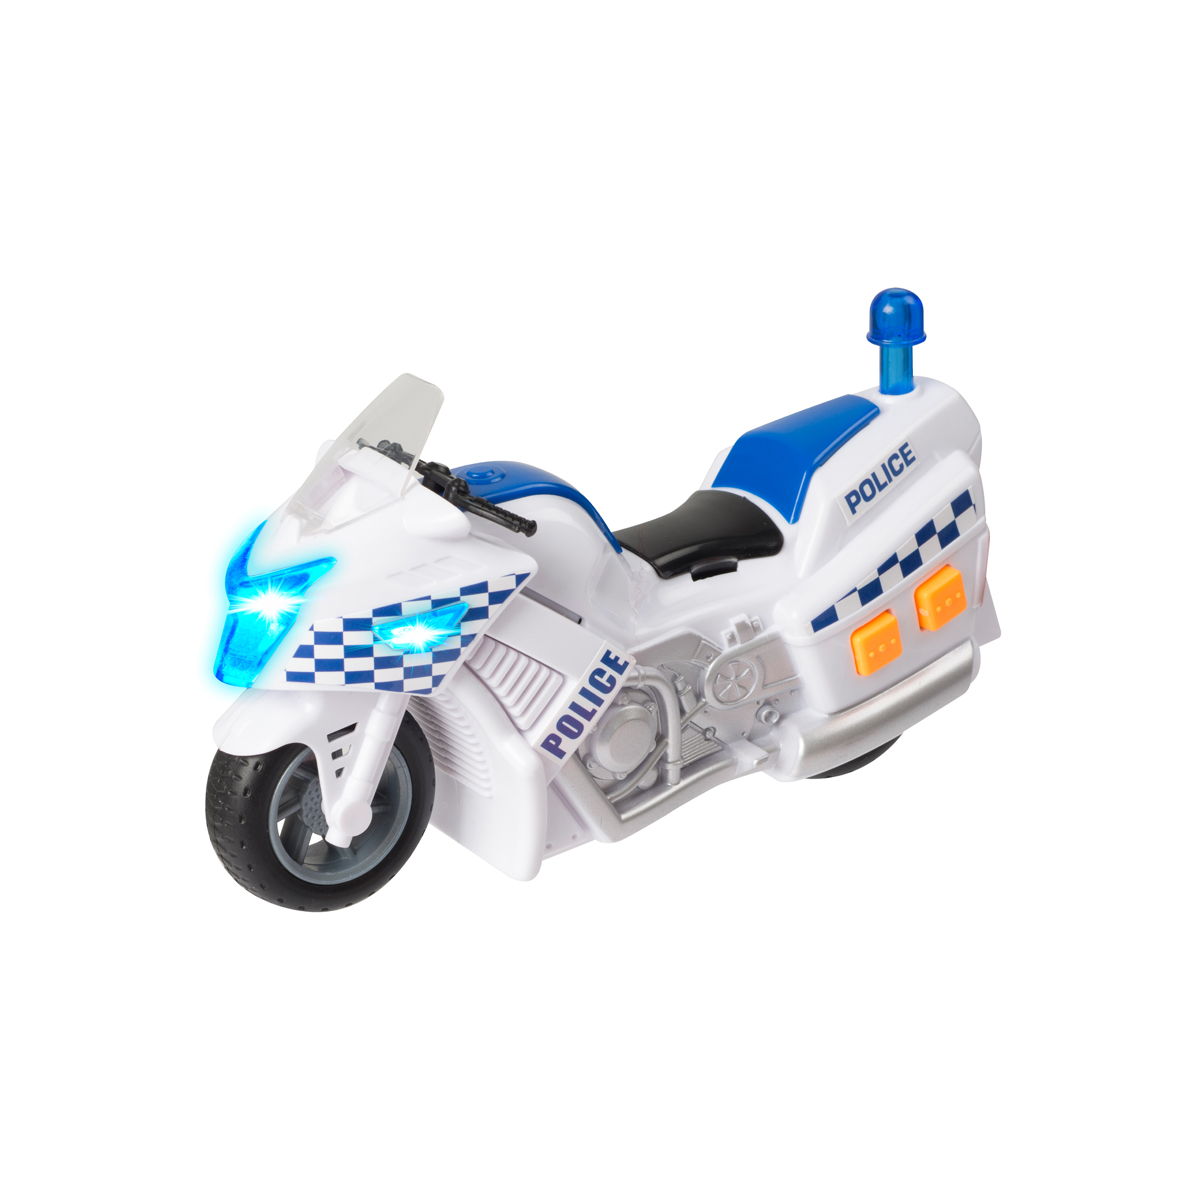 Teamsterz Polismotorcykel 15 cm med ljud & ljus